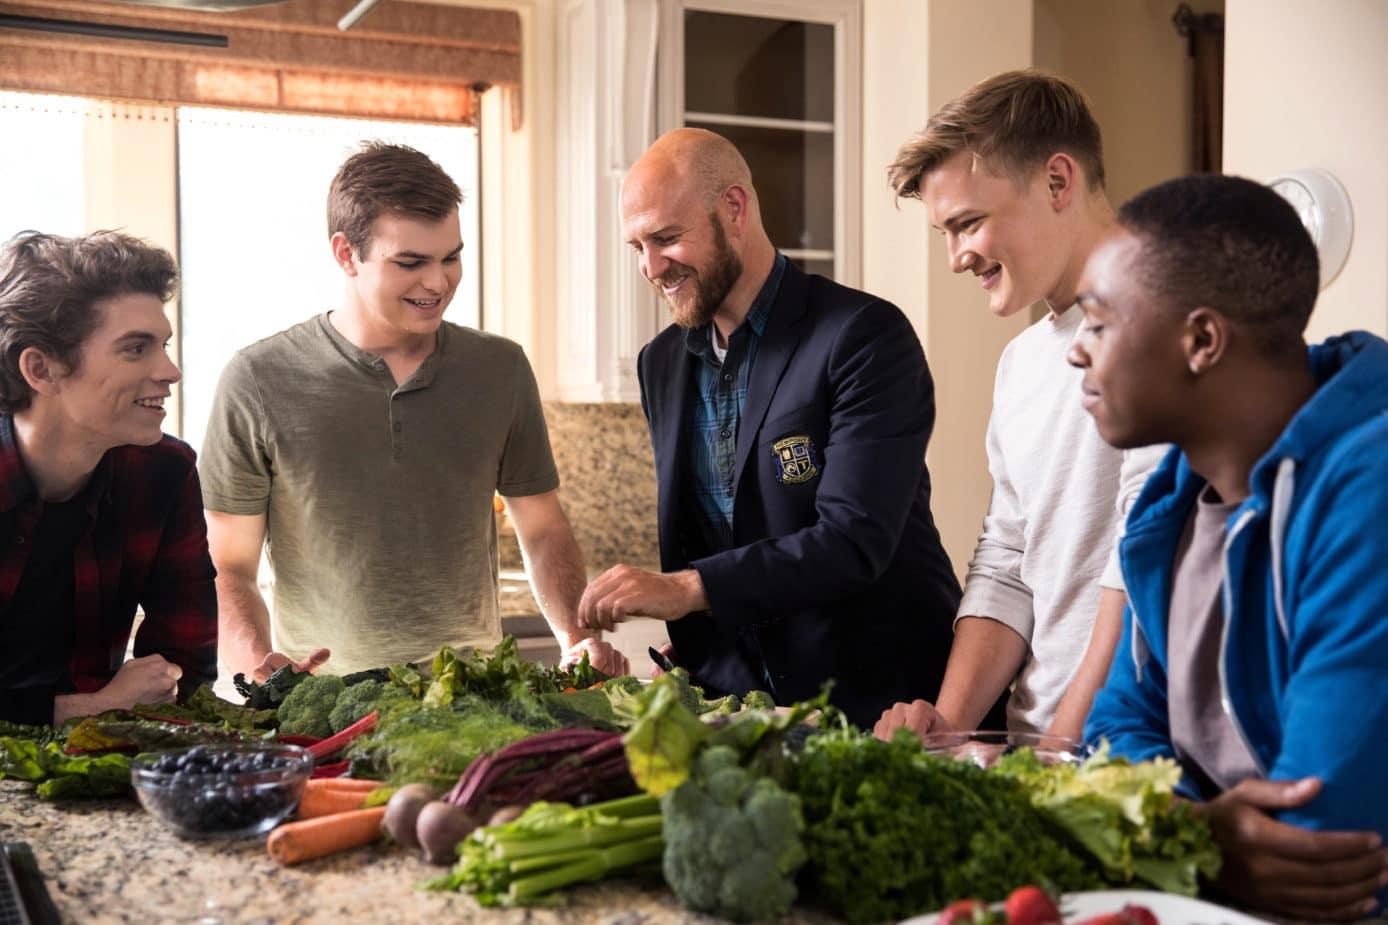 VICE: Clean_Eating_Veggies_Newport_Academy